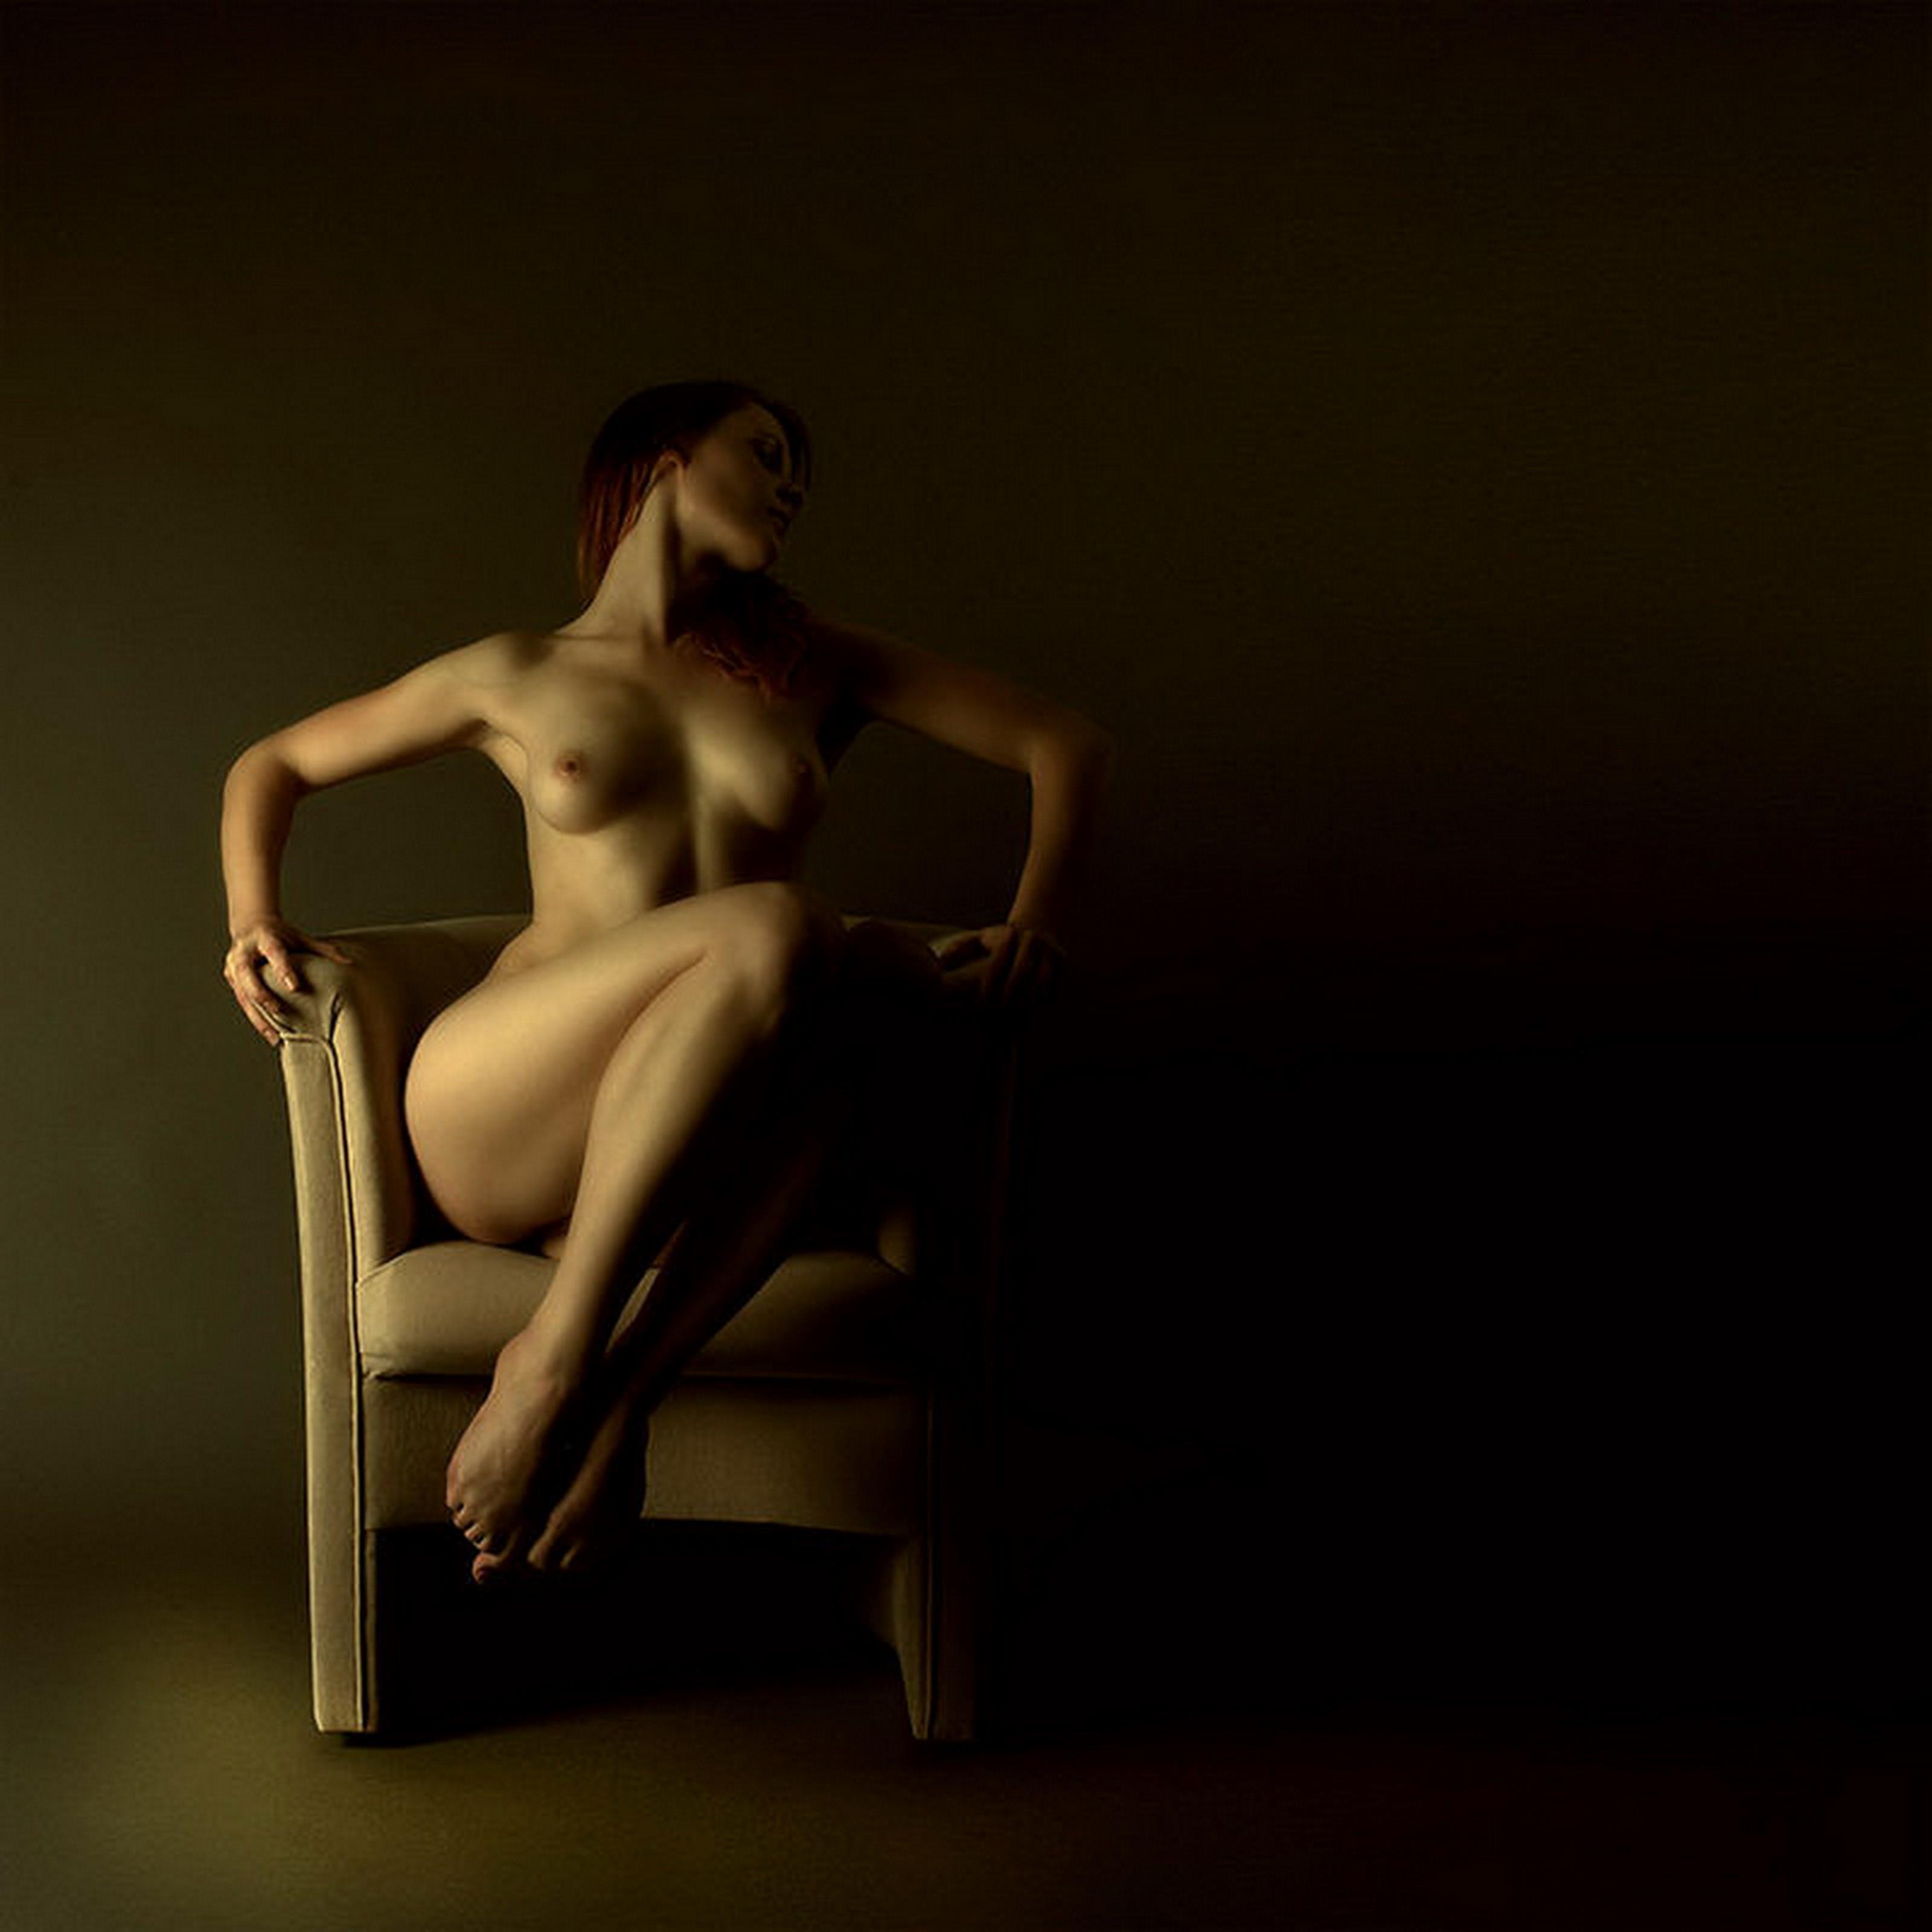 Фото эротика креатив 25 фотография